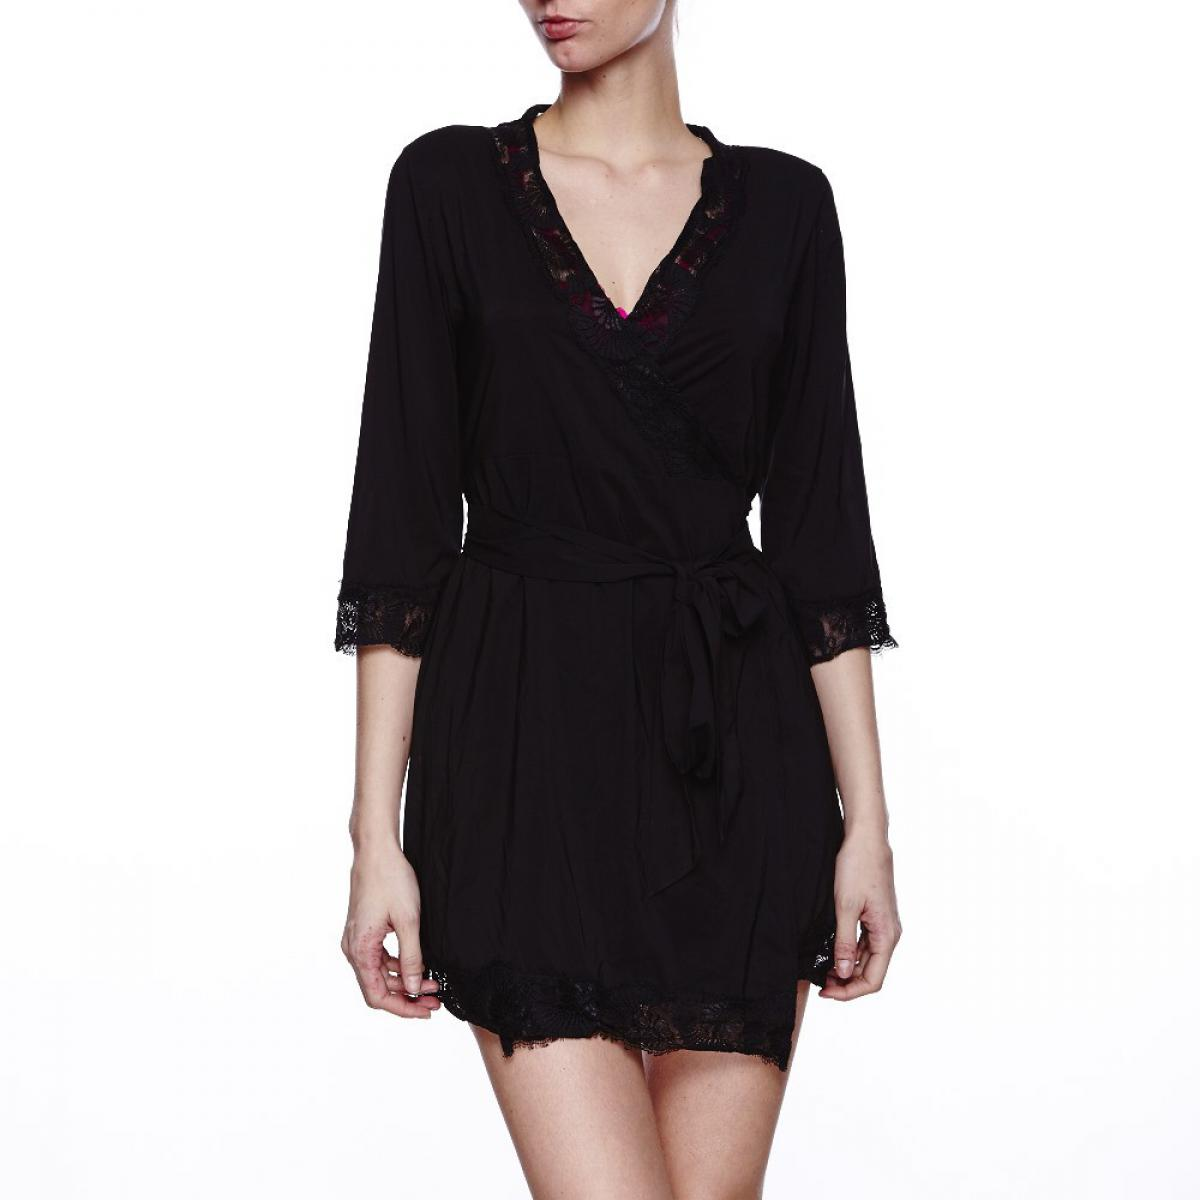 robe de chambre jada black par l 39 agent by agent provocateur. Black Bedroom Furniture Sets. Home Design Ideas